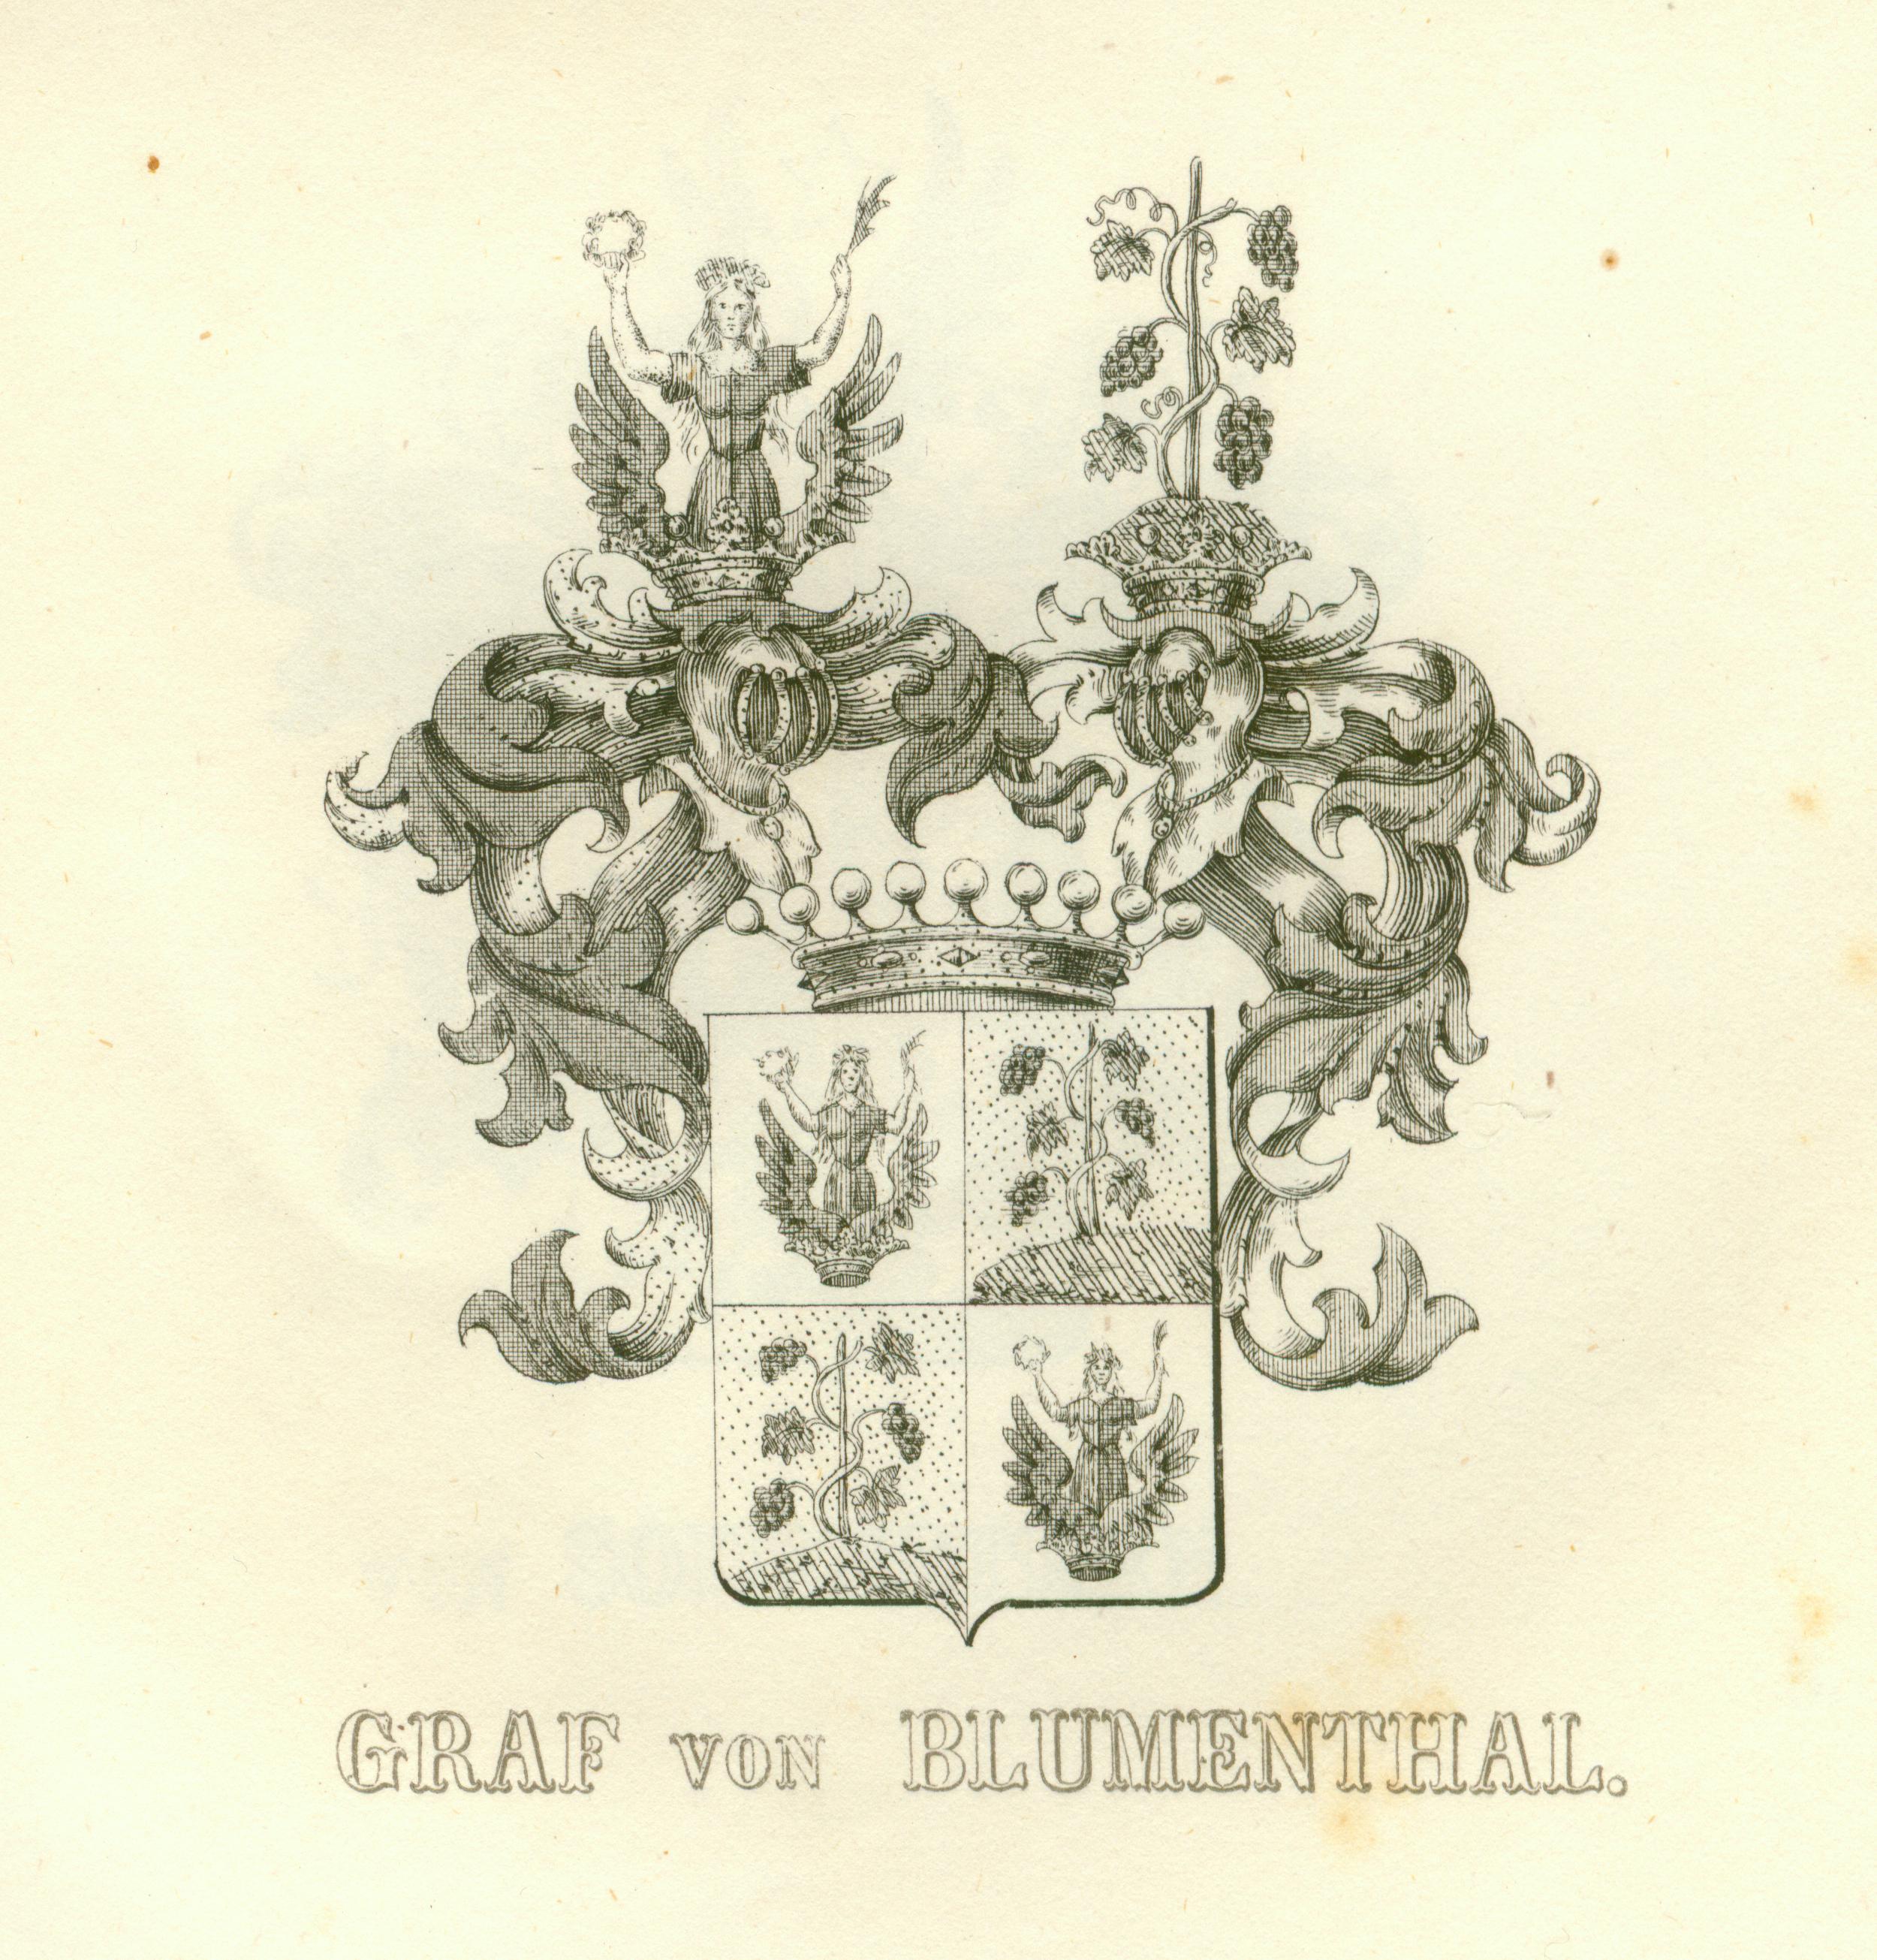 Blumenthal hrabia